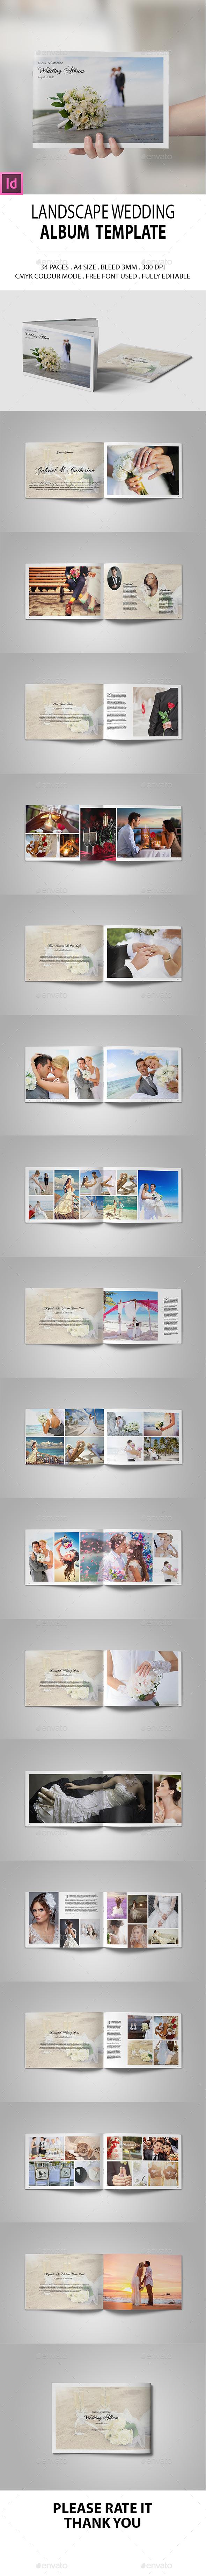 wedding album graphics designs templates from graphicriver